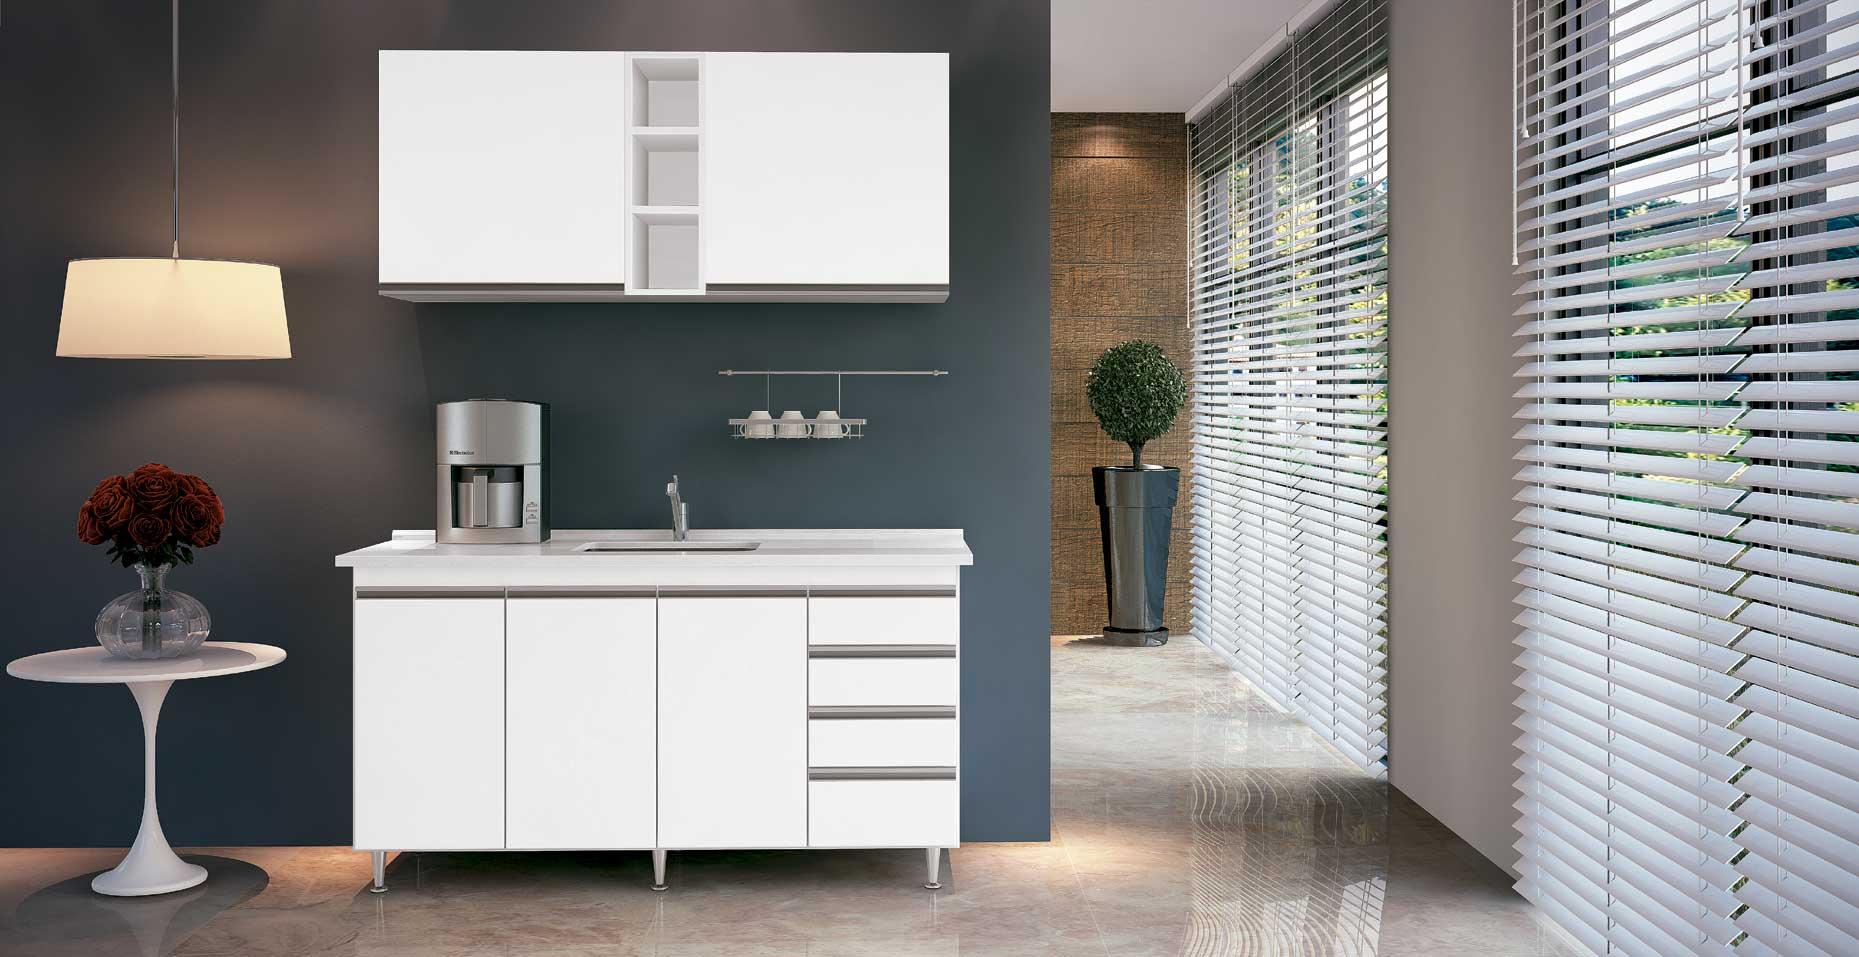 Gabinete Para Banheiro Bumi moveis cozinha -> Gabinete De Banheiro Bumi